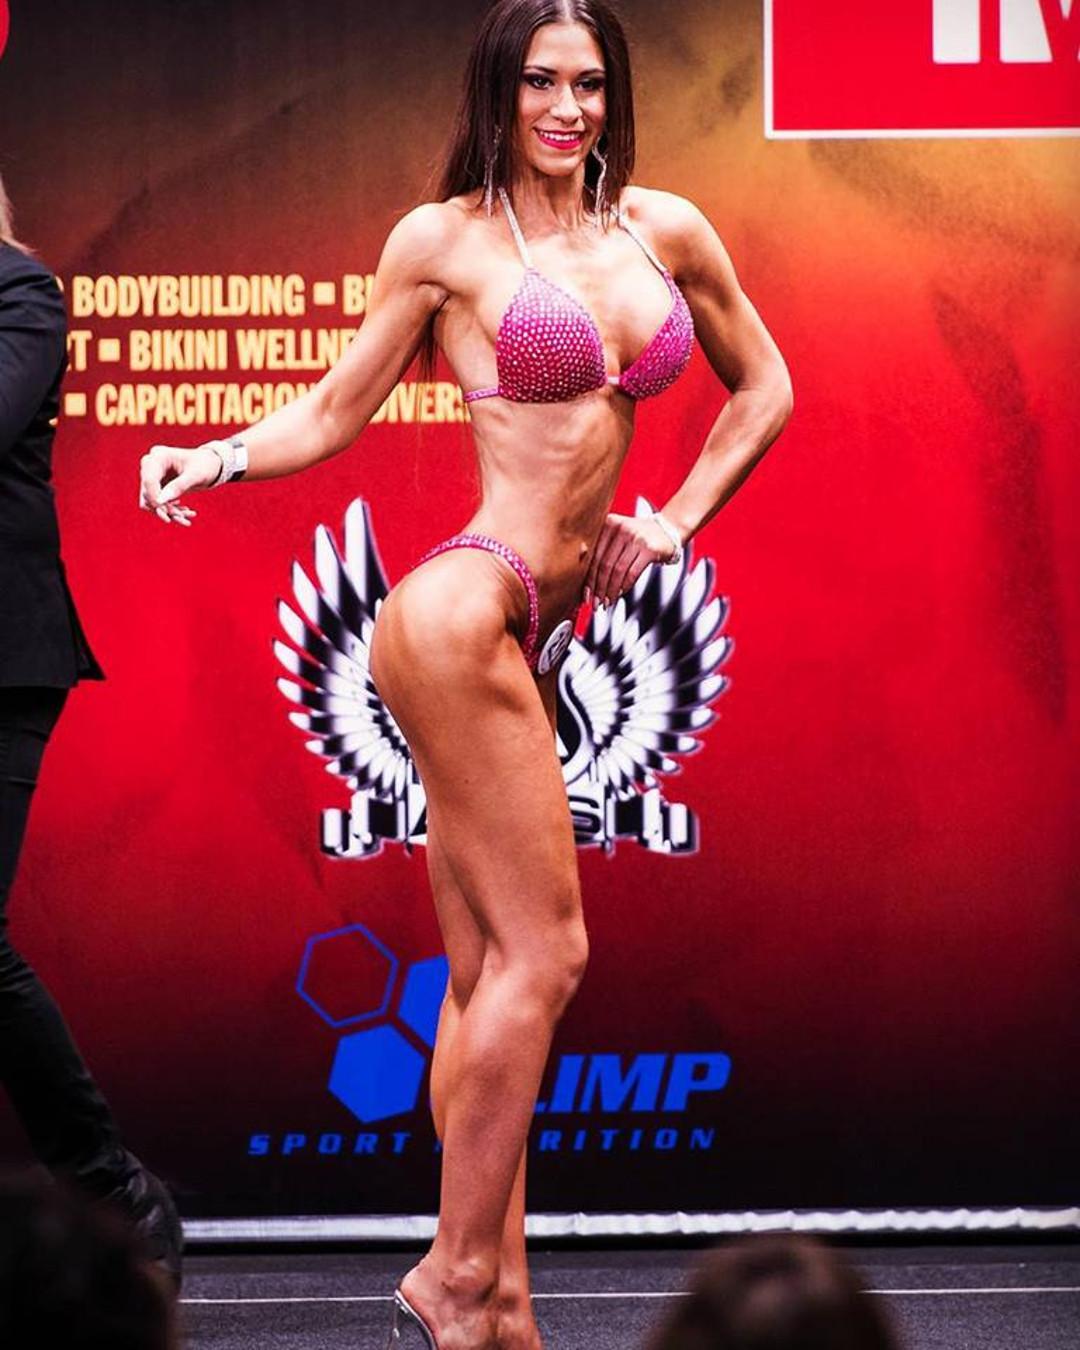 Ana alvarez fitness